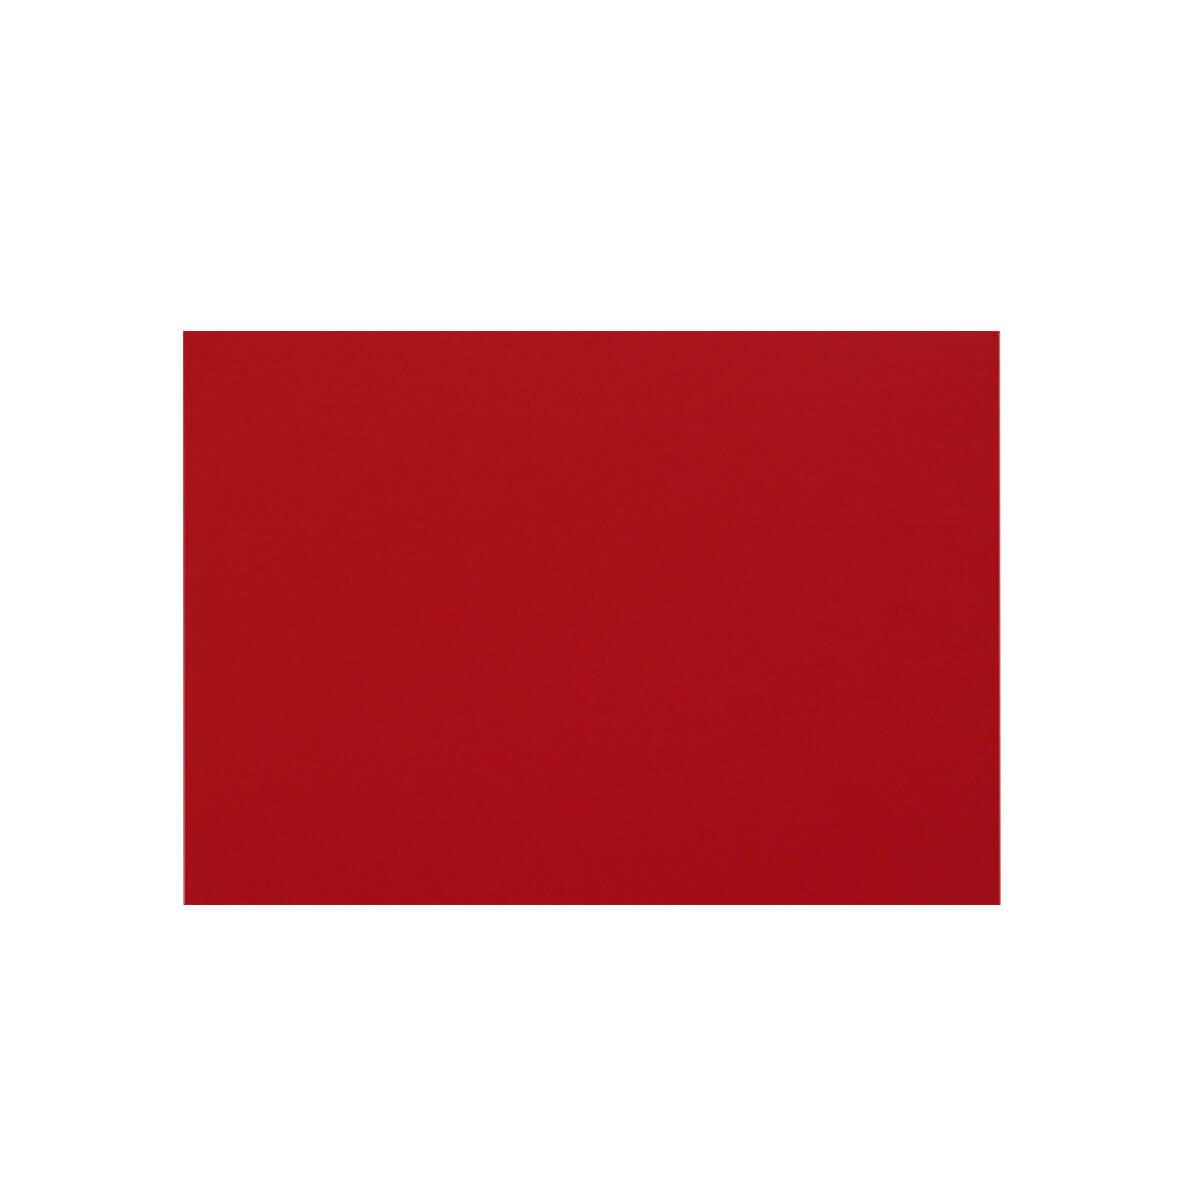 C6 DARK RED ENVELOPES 120GSM